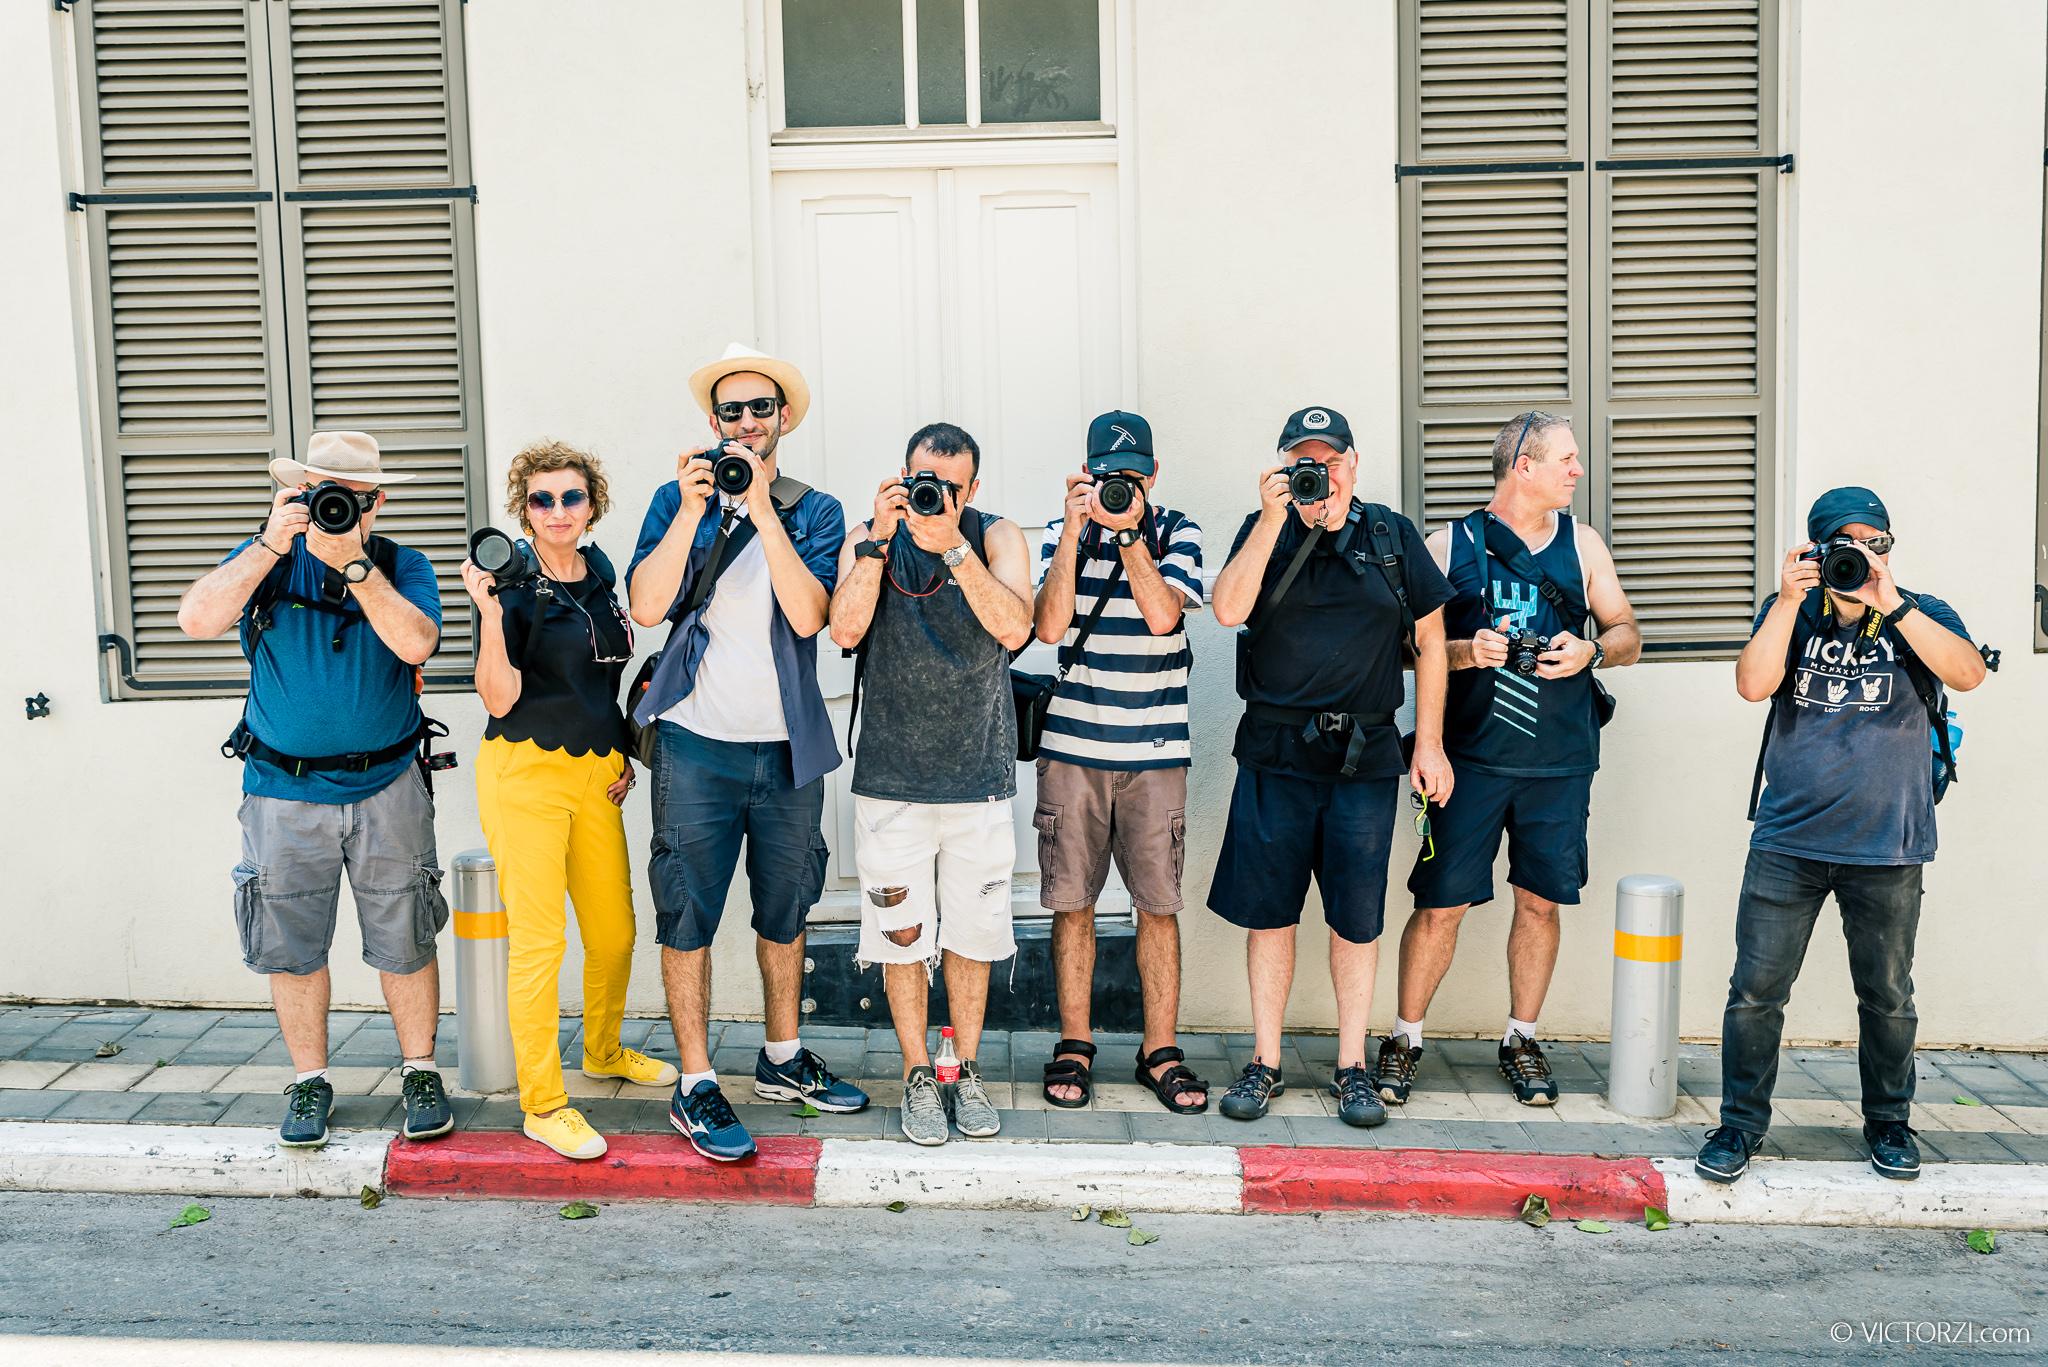 20190726 - Tel Aviv Street Photography w